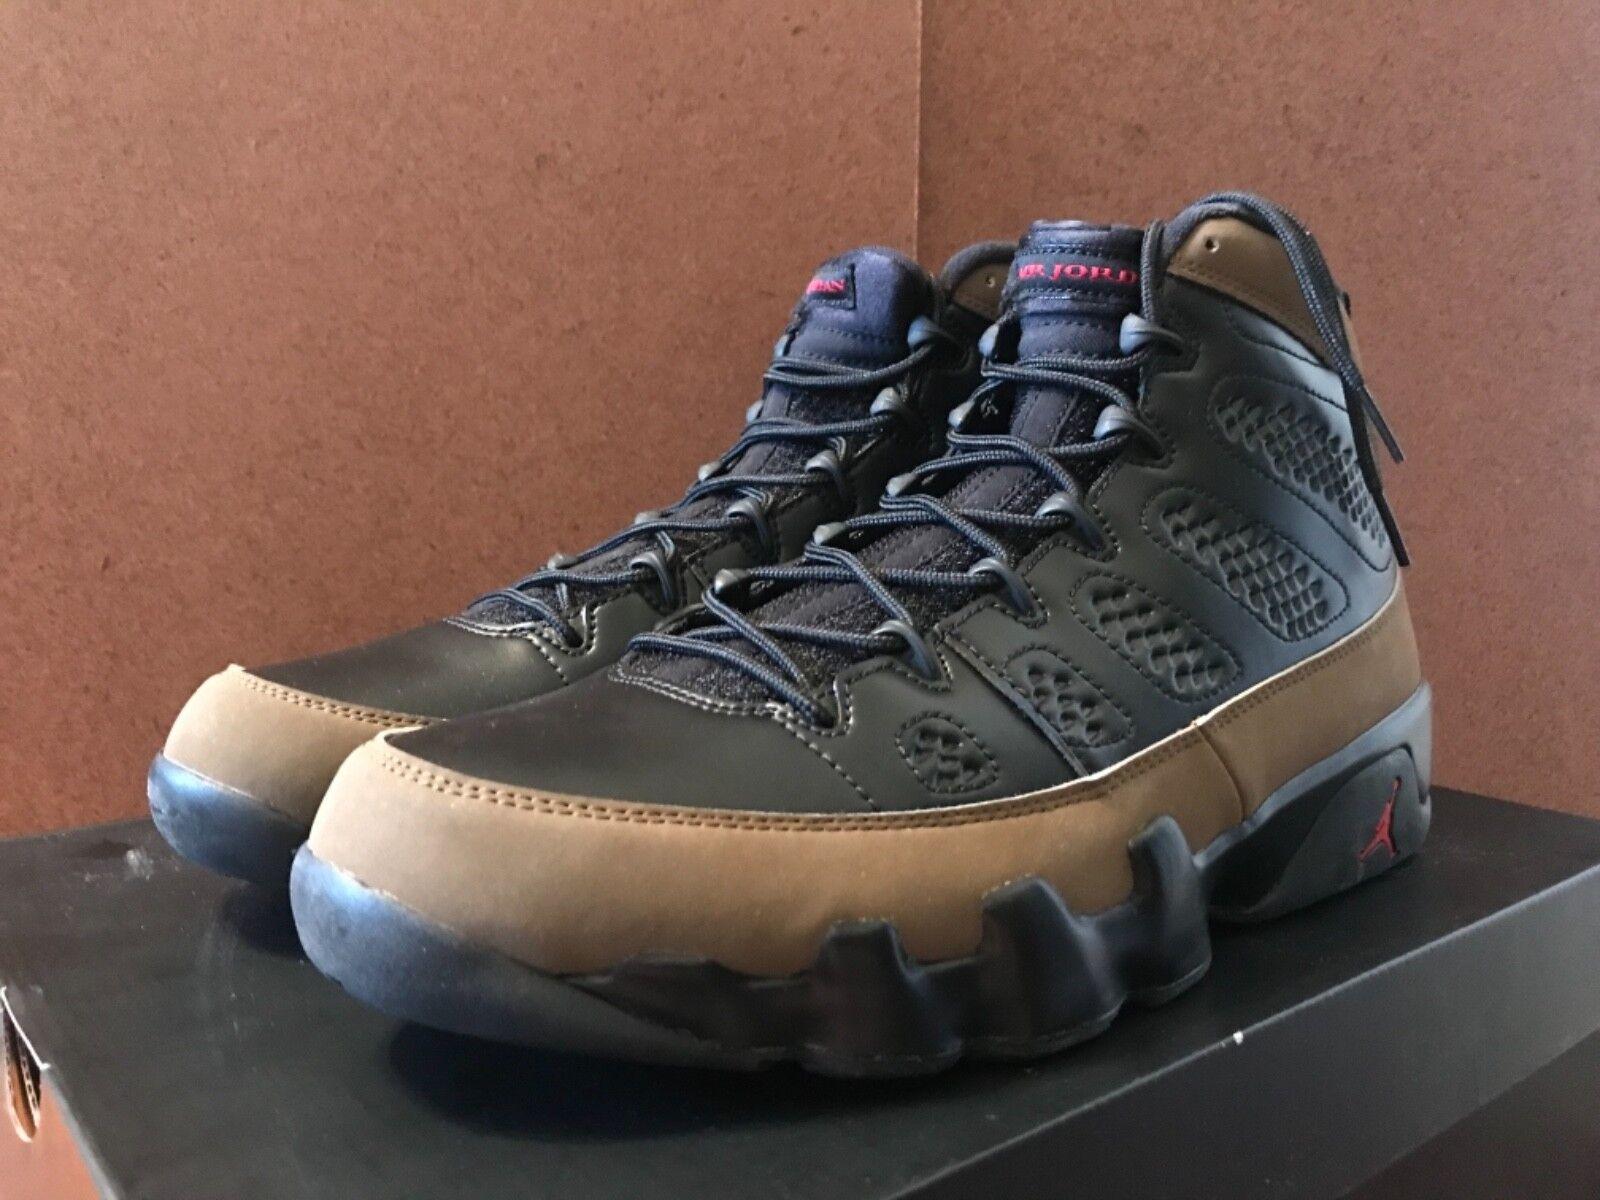 Air Jordan 9 Olive 2012 DS sz11.5